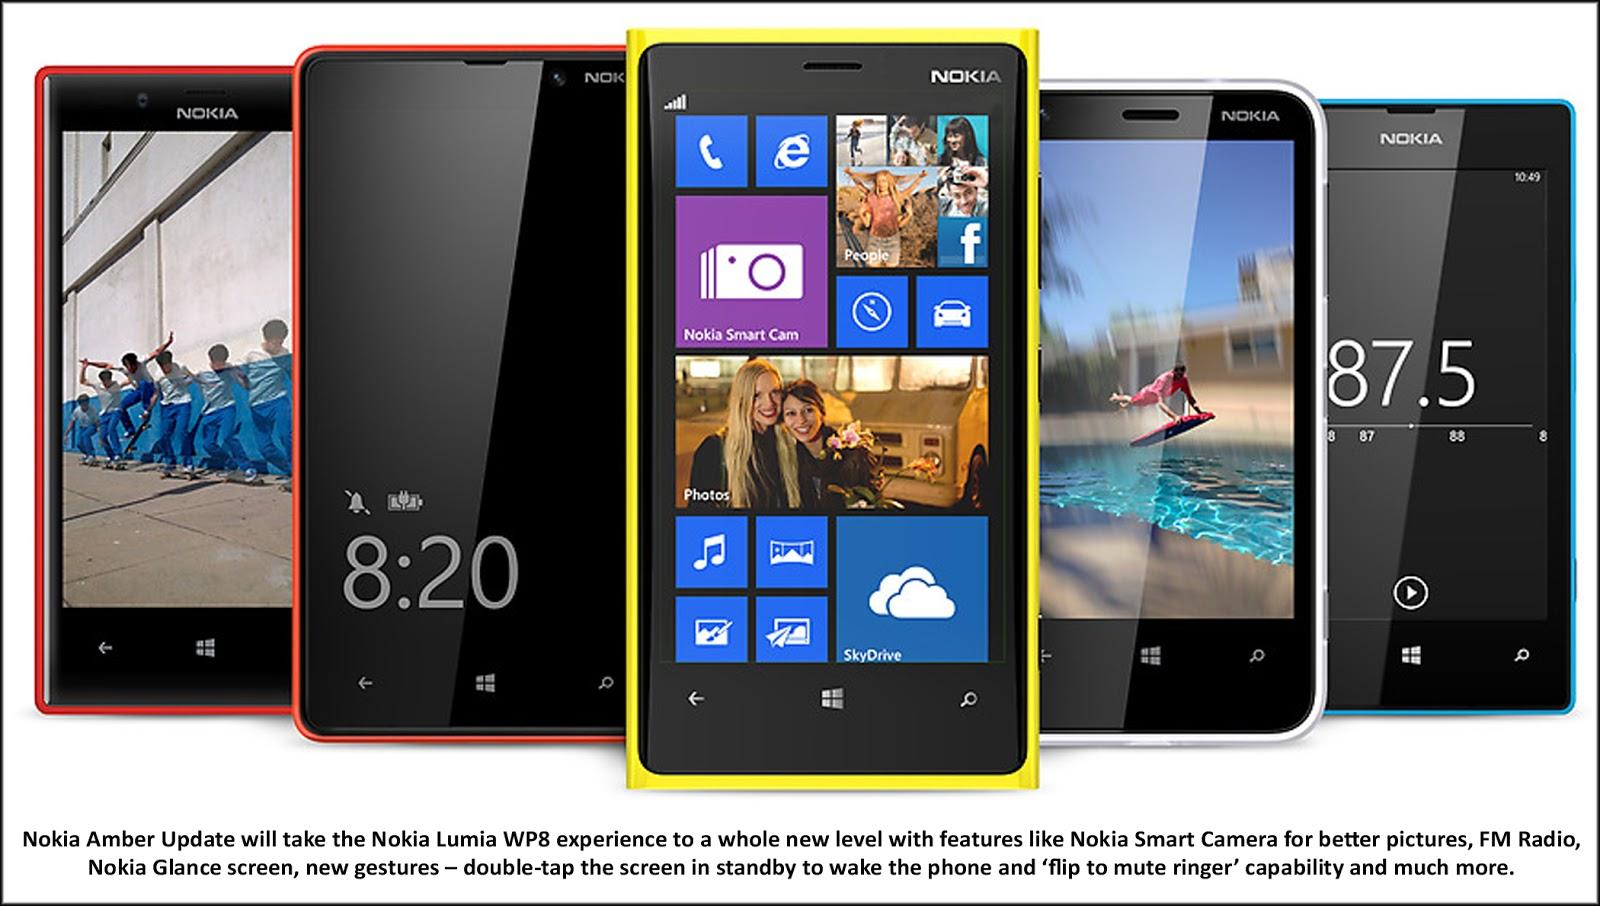 Nokia Makes Ready for Windows 8 Production